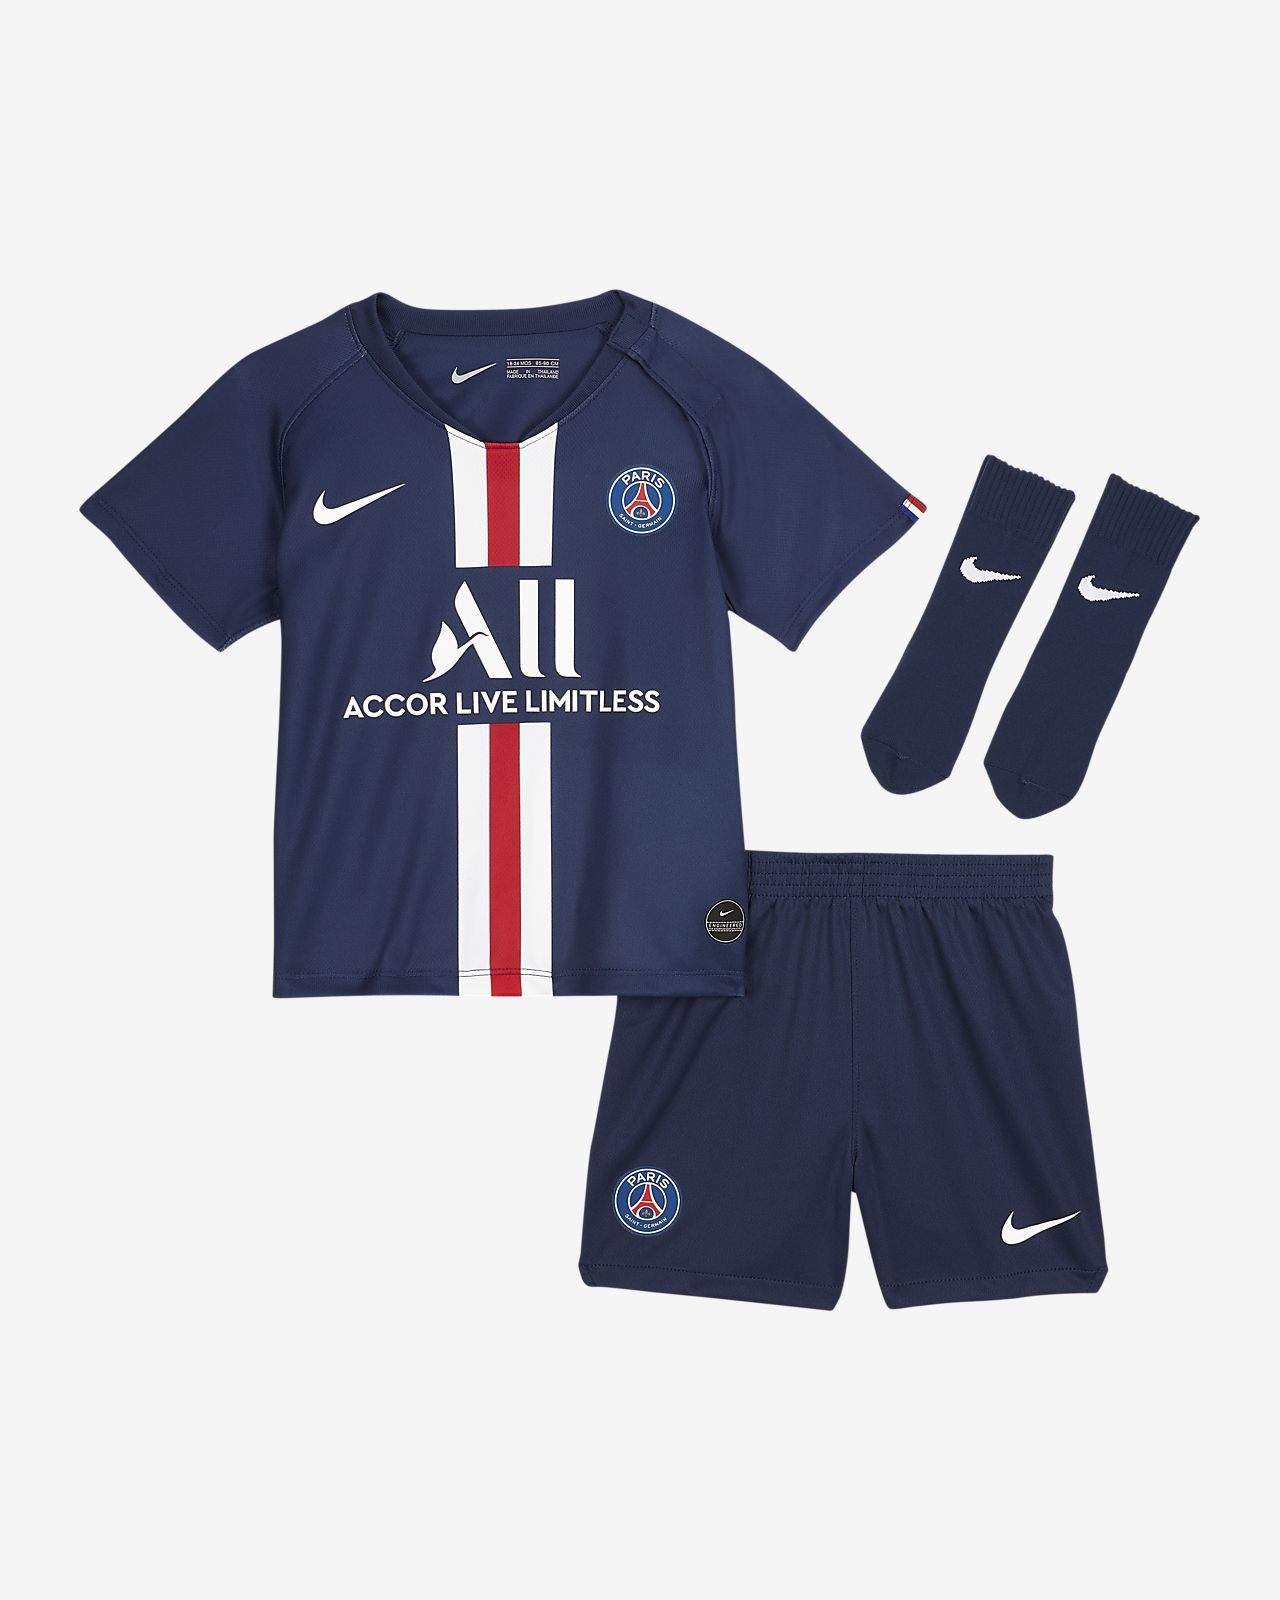 Paris Saint-Germain 2019/20 Home Baby and Toddler Kit